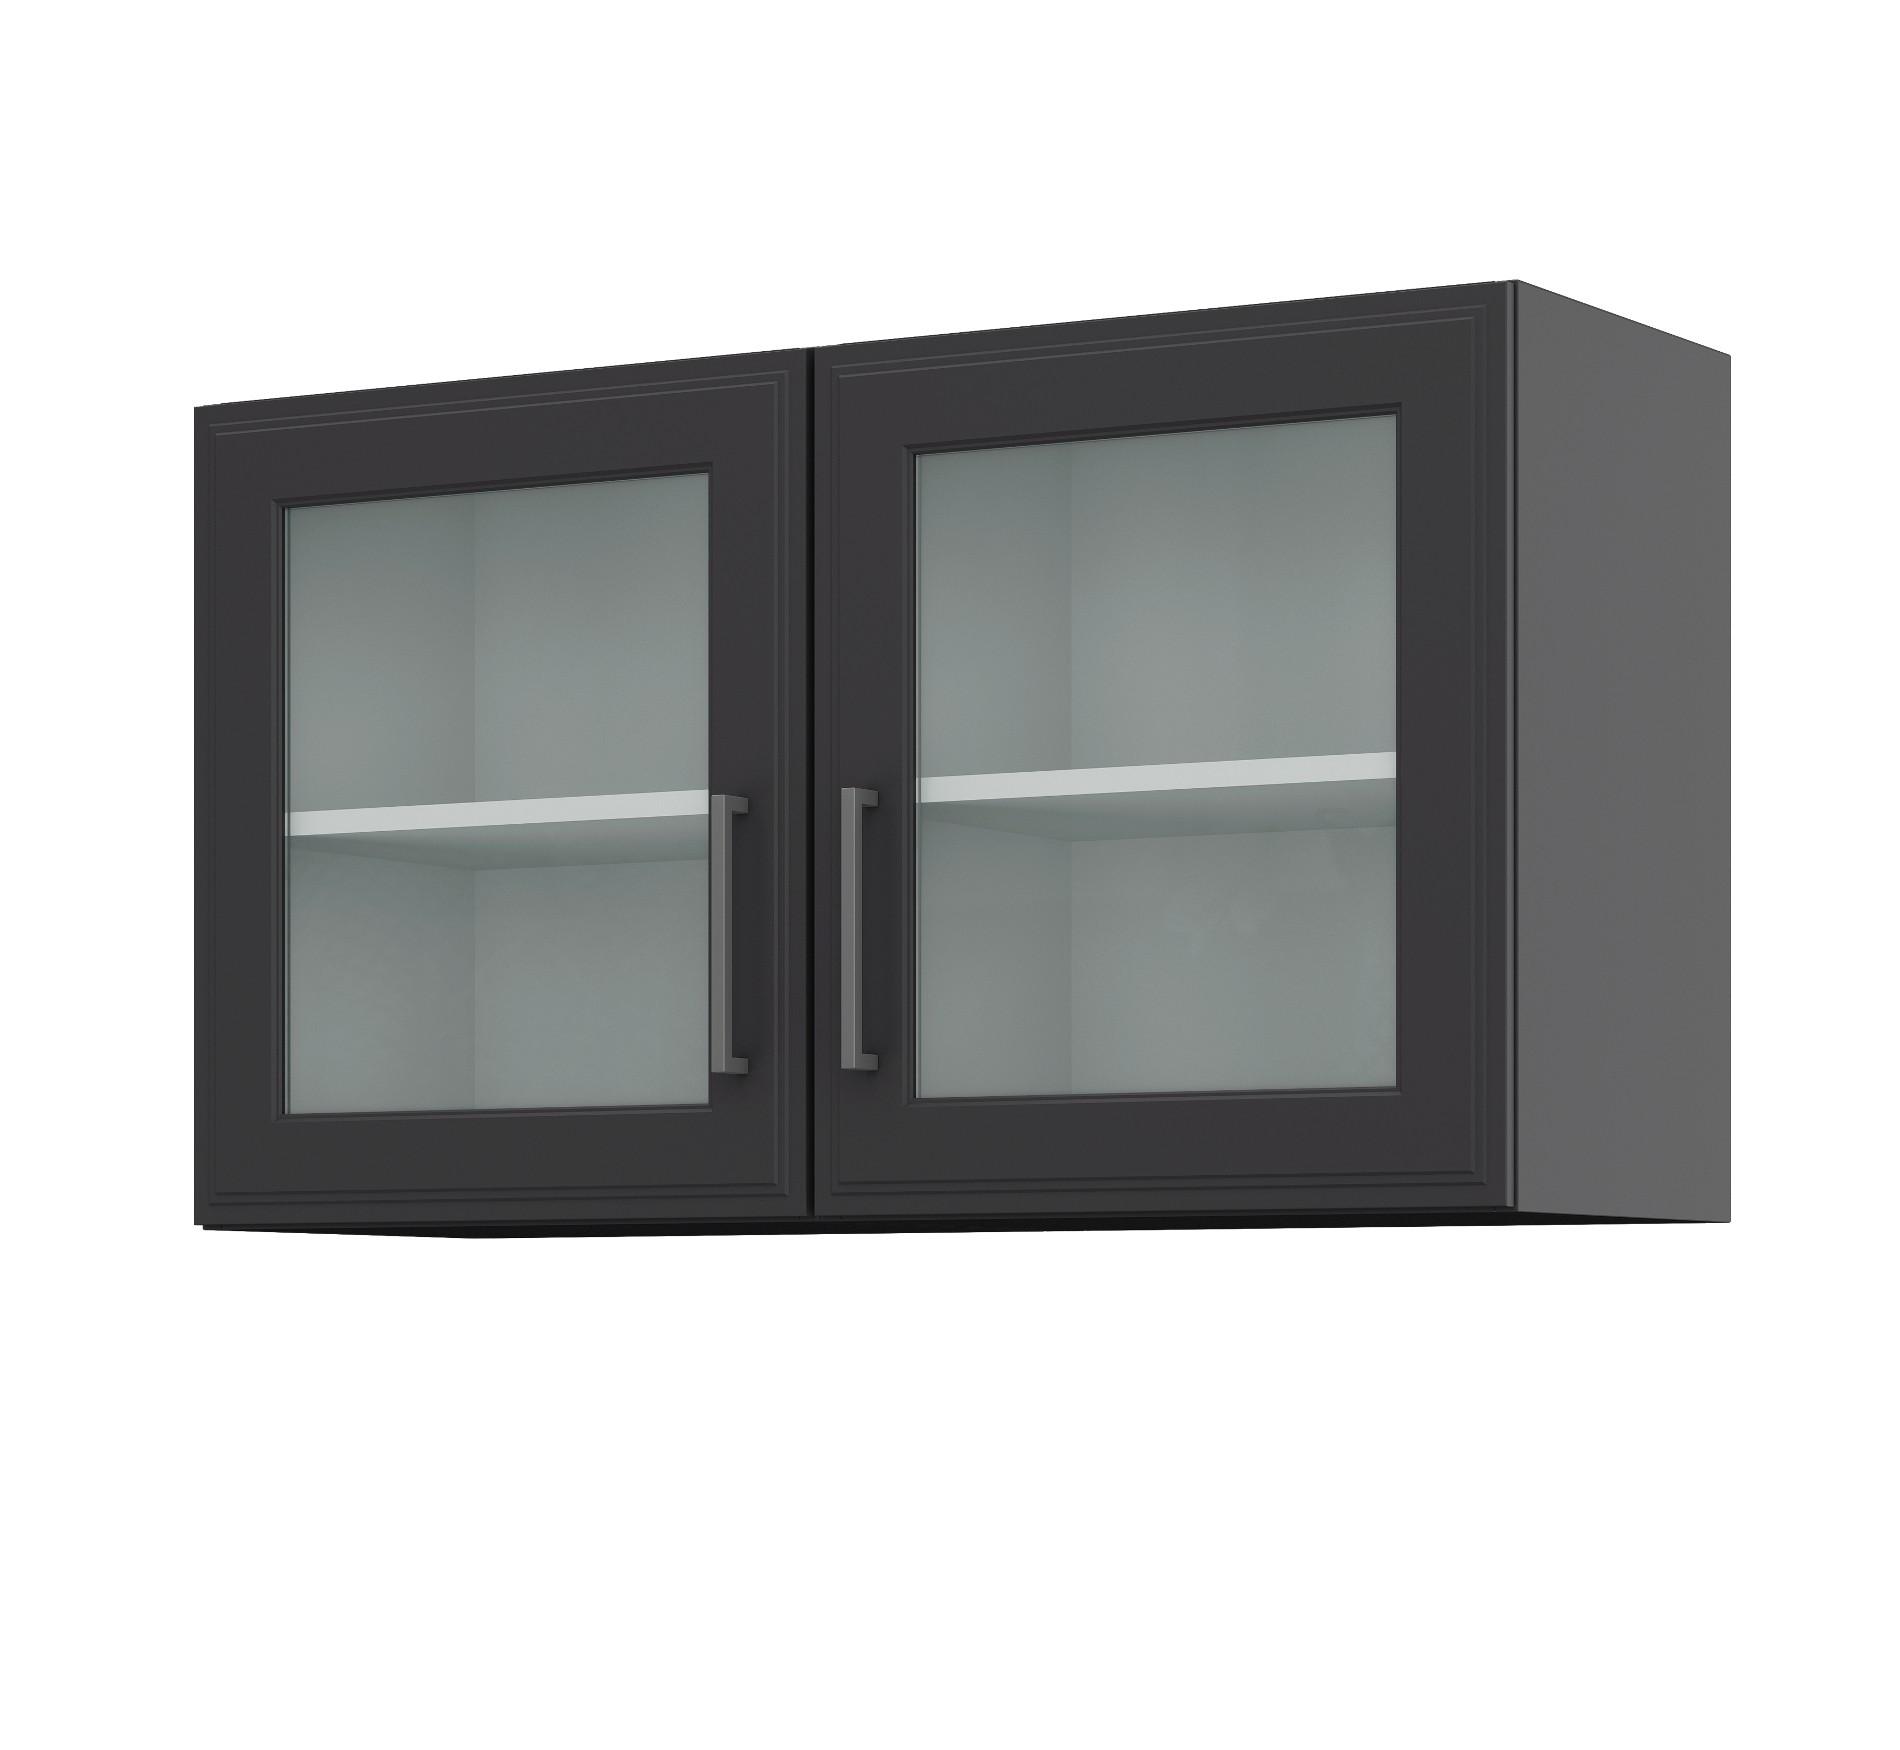 k chen glash ngeschrank k ln 2 t rig breite 100 cm grau graphit k che k chen h ngeschr nke. Black Bedroom Furniture Sets. Home Design Ideas